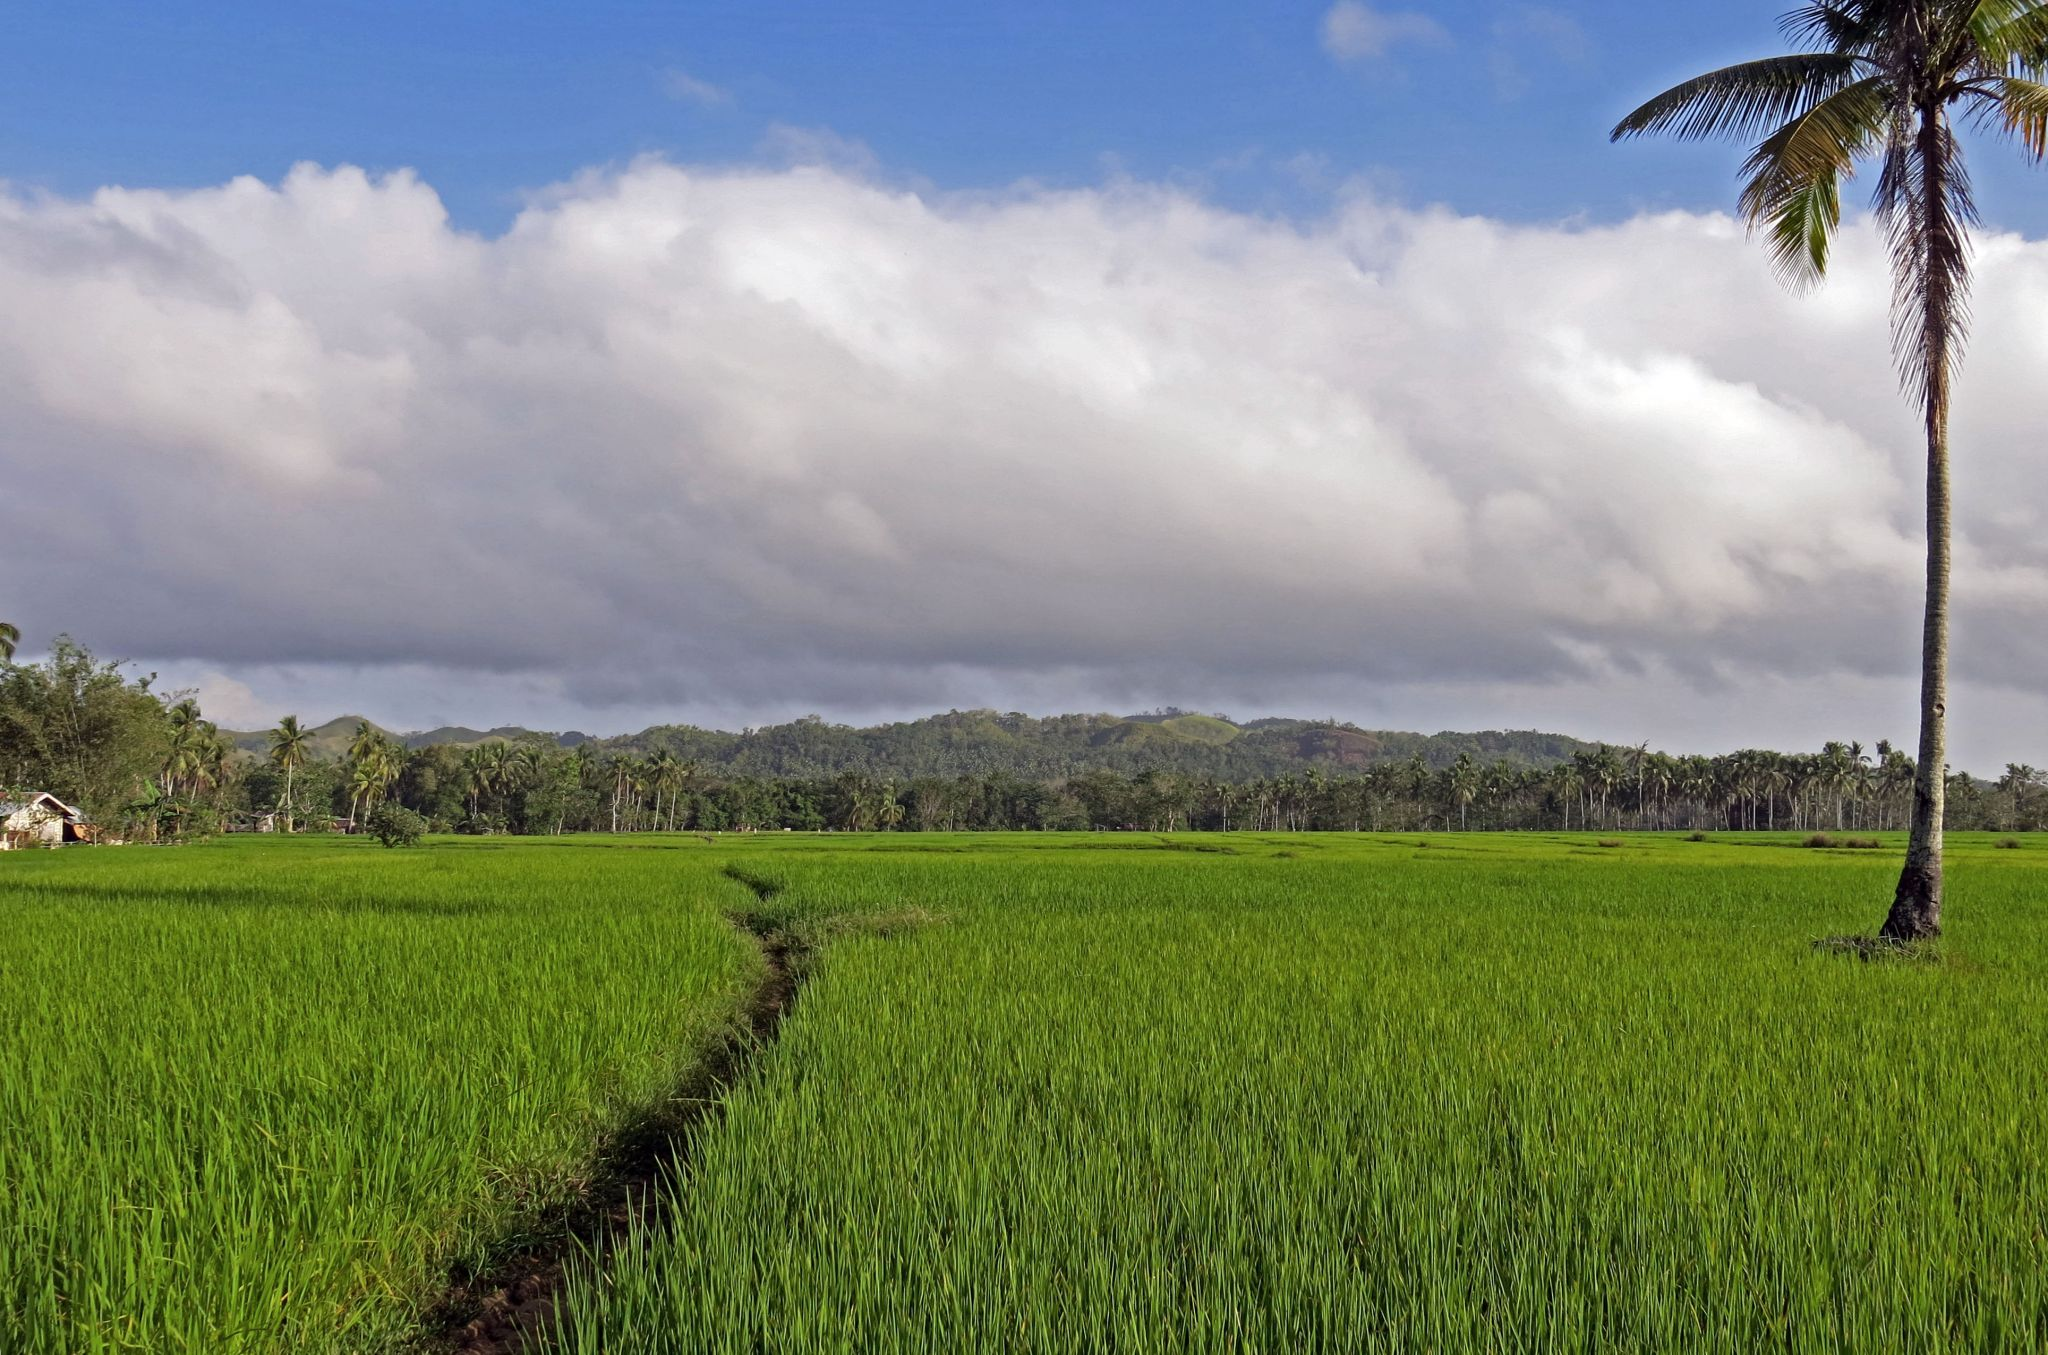 Tabonuk near Dagohoy, Philippines